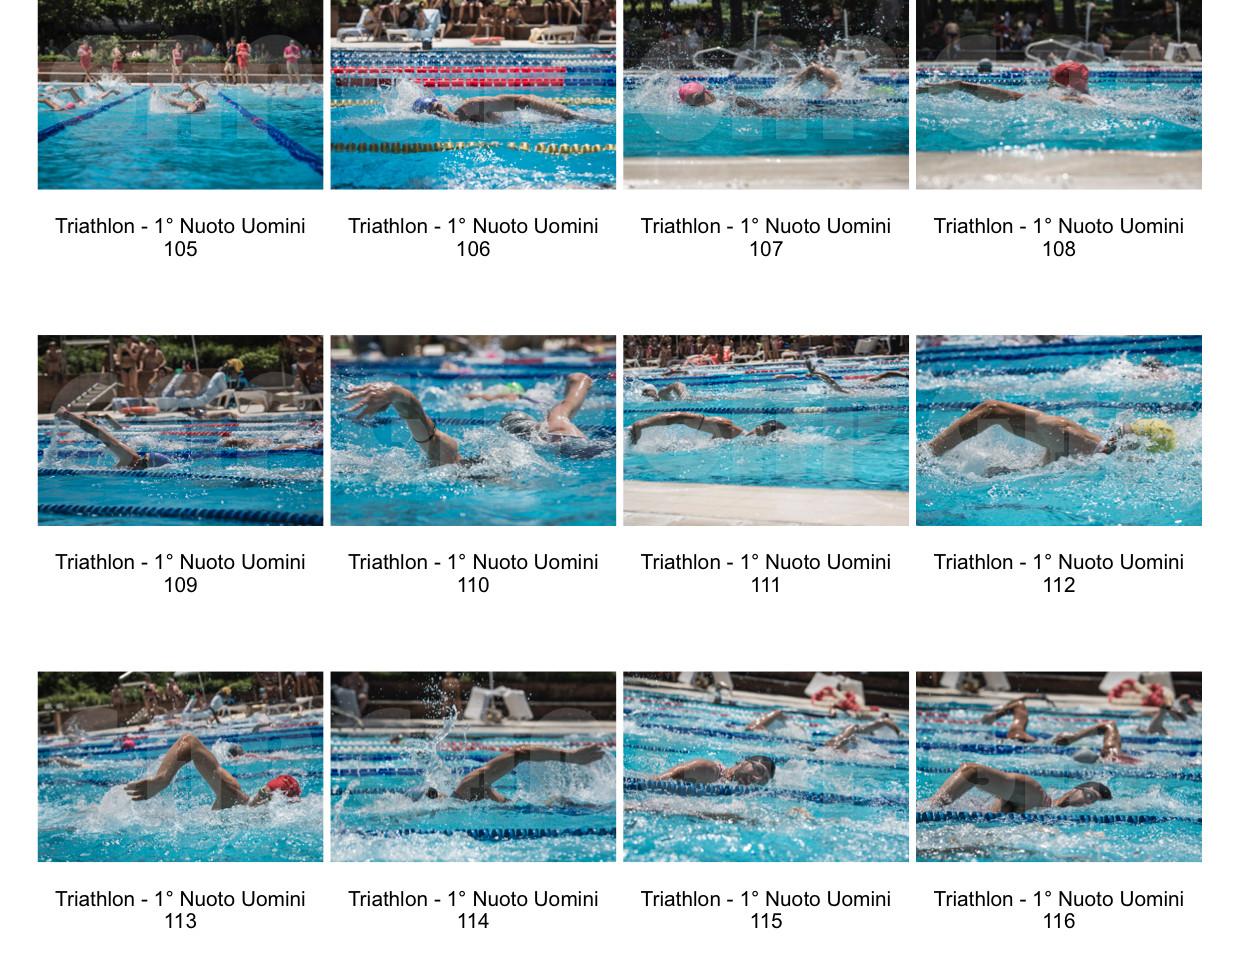 Triathlon_V.Elsa_-_1°_Frazione_Nuoto_Uomini_-06.jpg